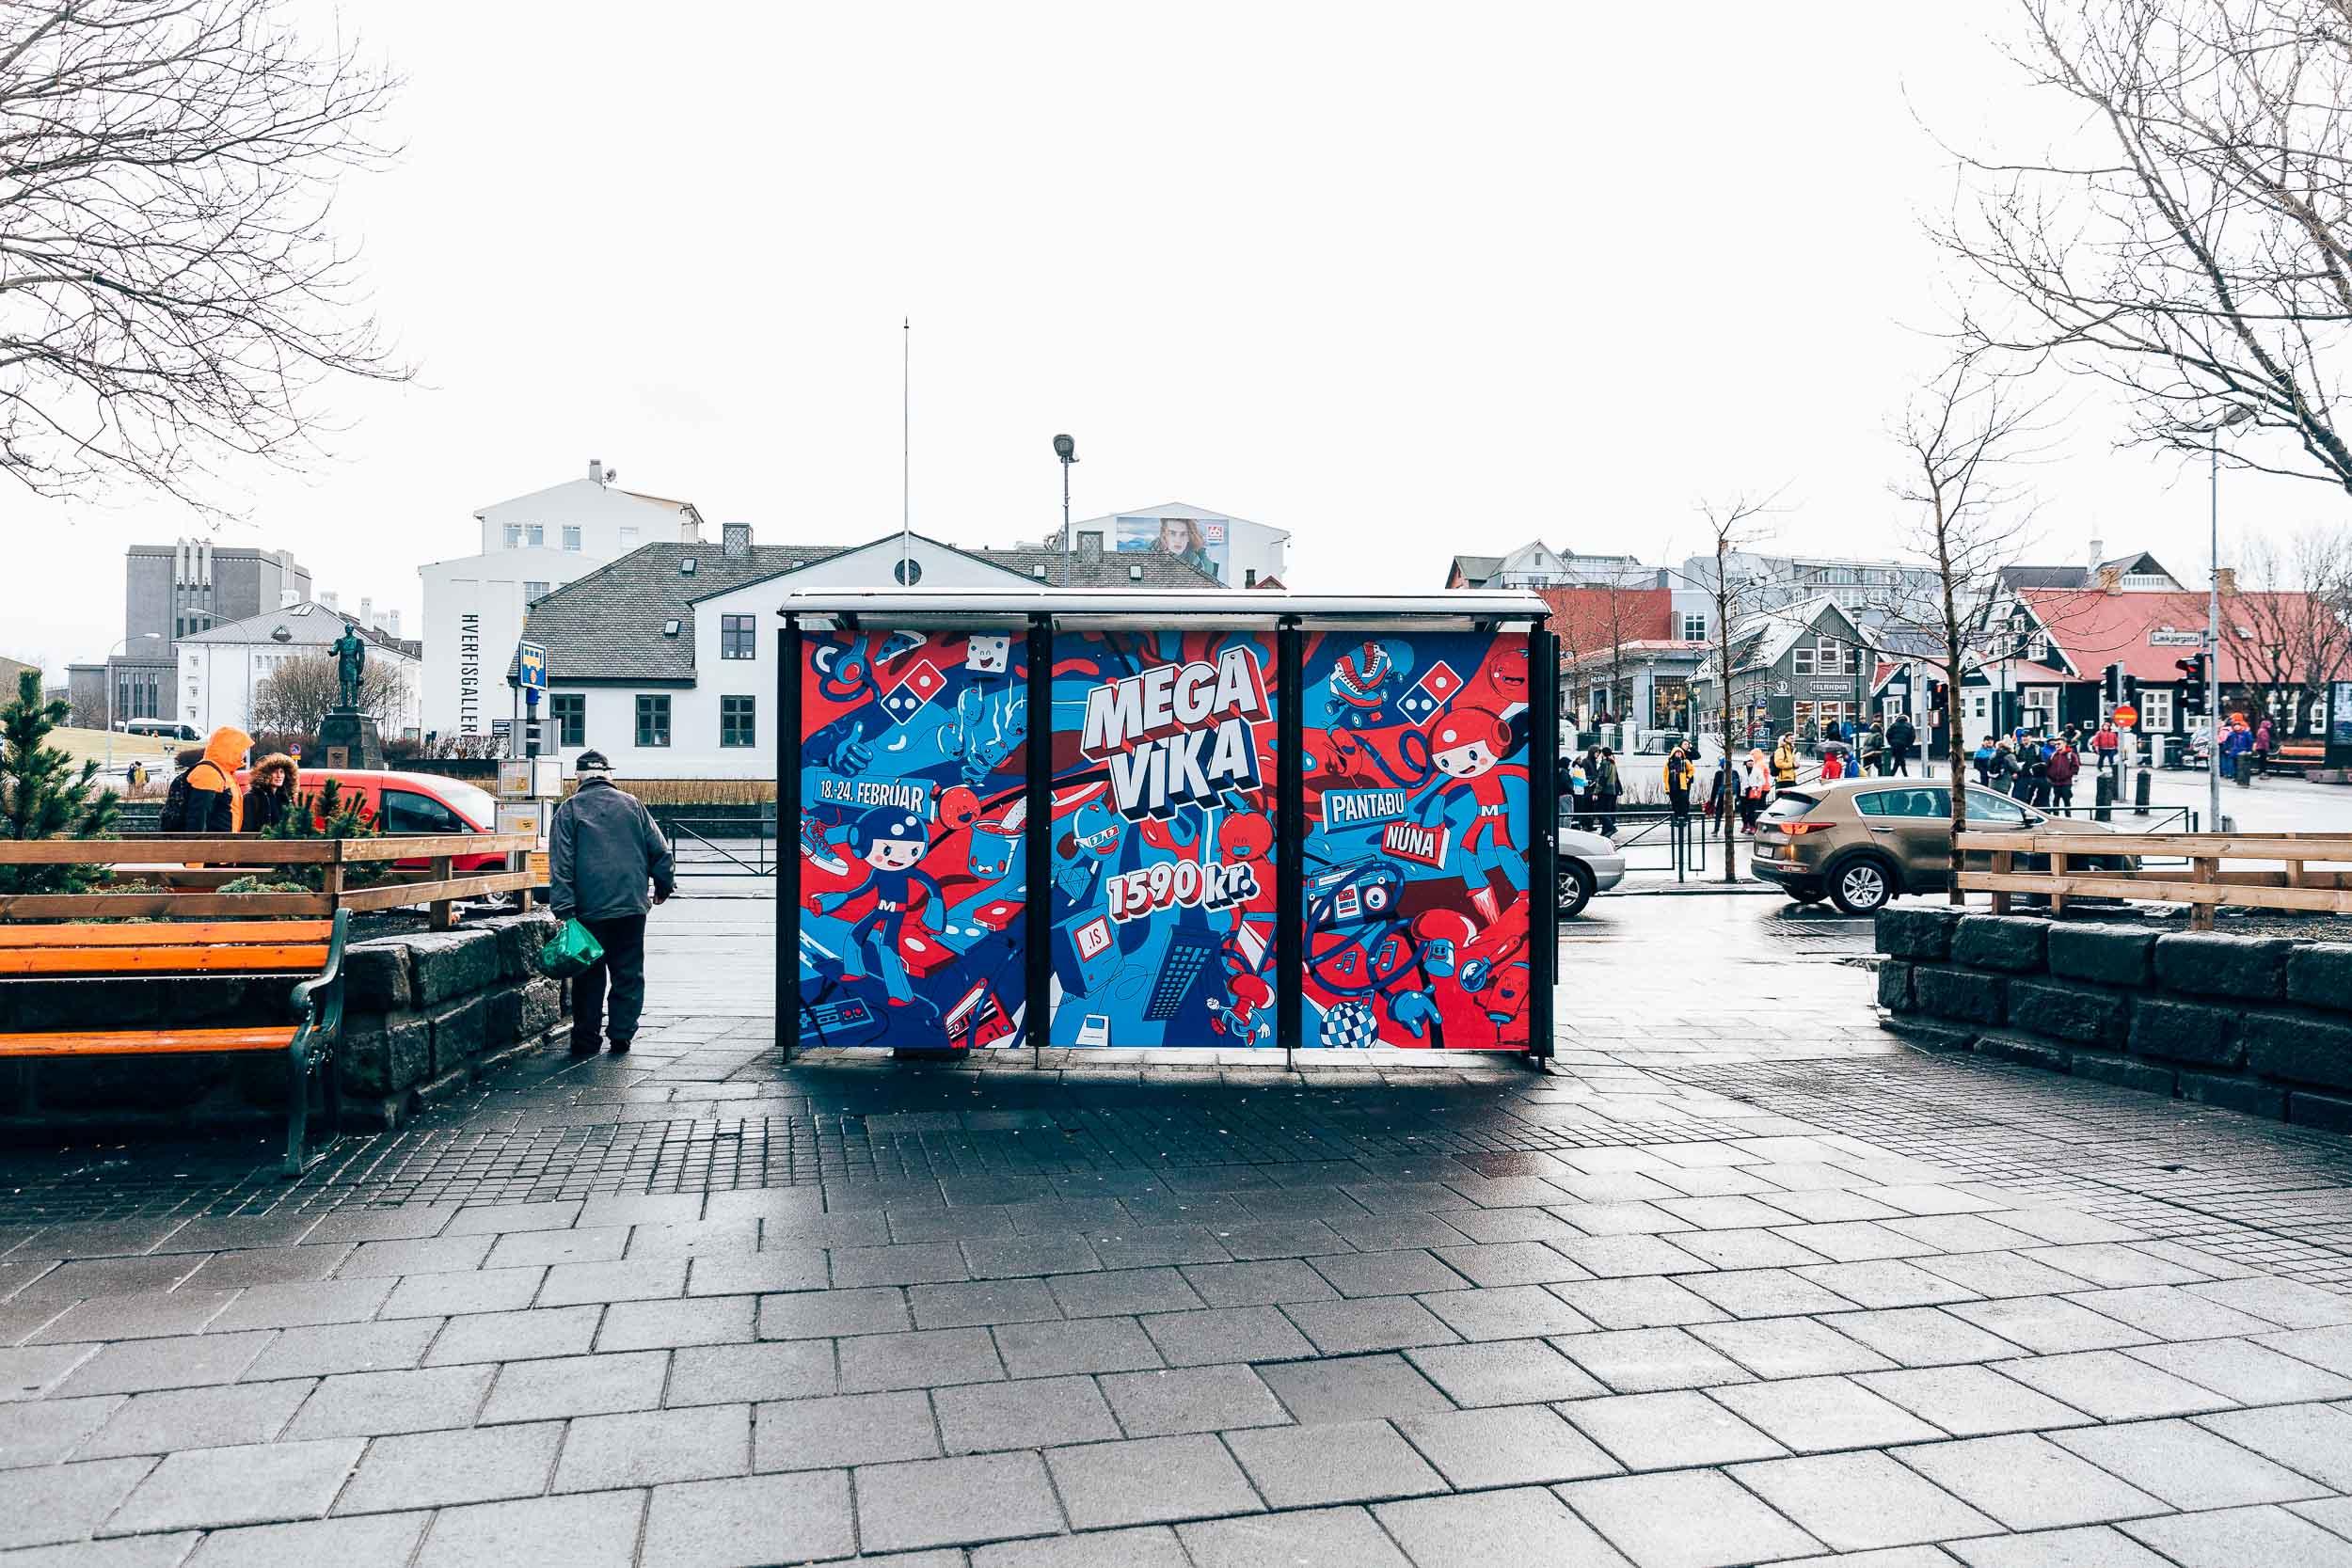 02_2019_Iceland-28.jpg